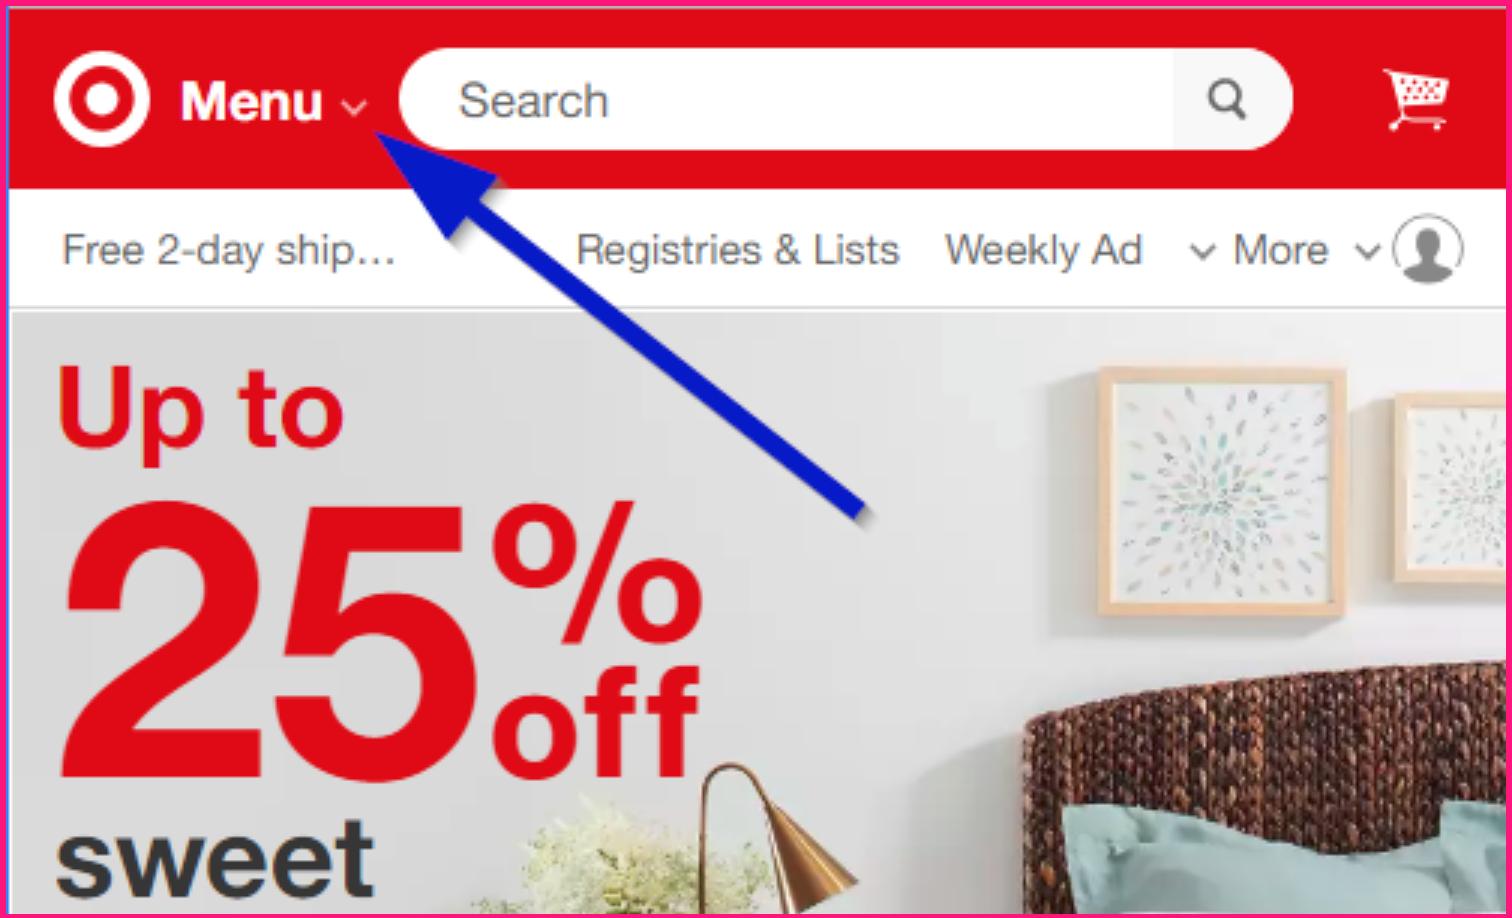 Screenshot showing how Target uses an arrow-click menu looks like on their website